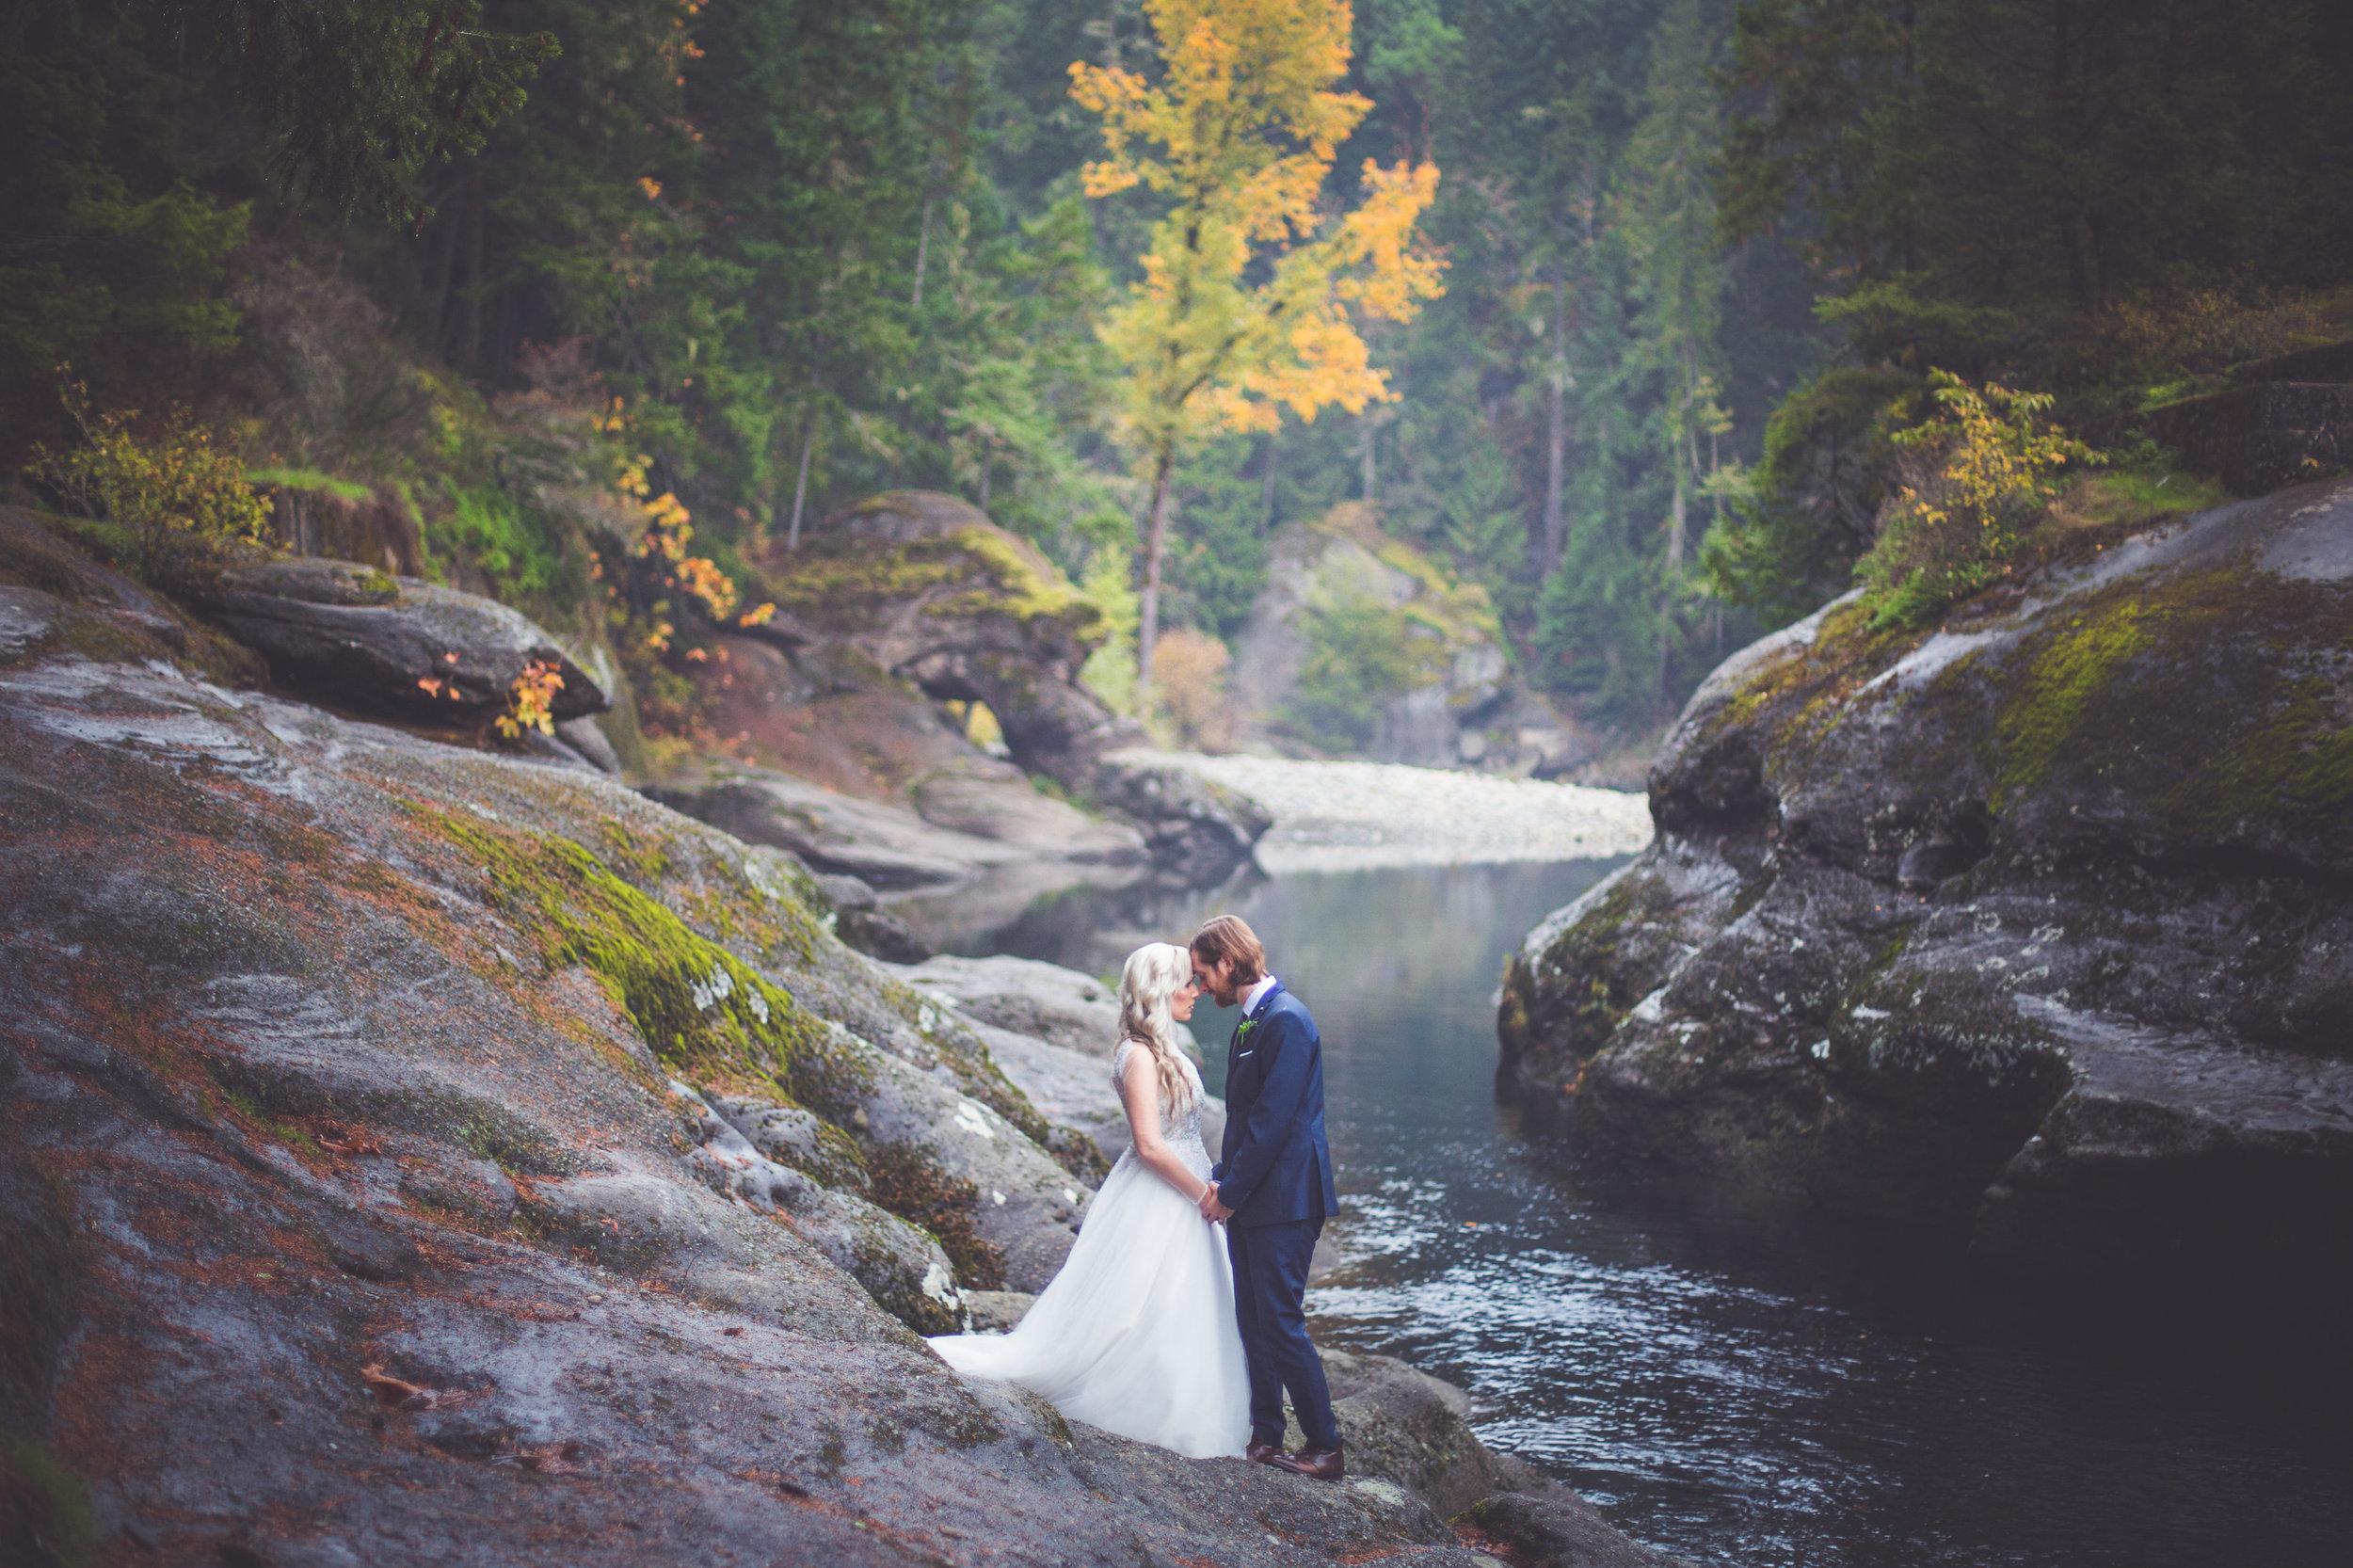 whimsical-romantic-wedding-top-bridge-3.jpg